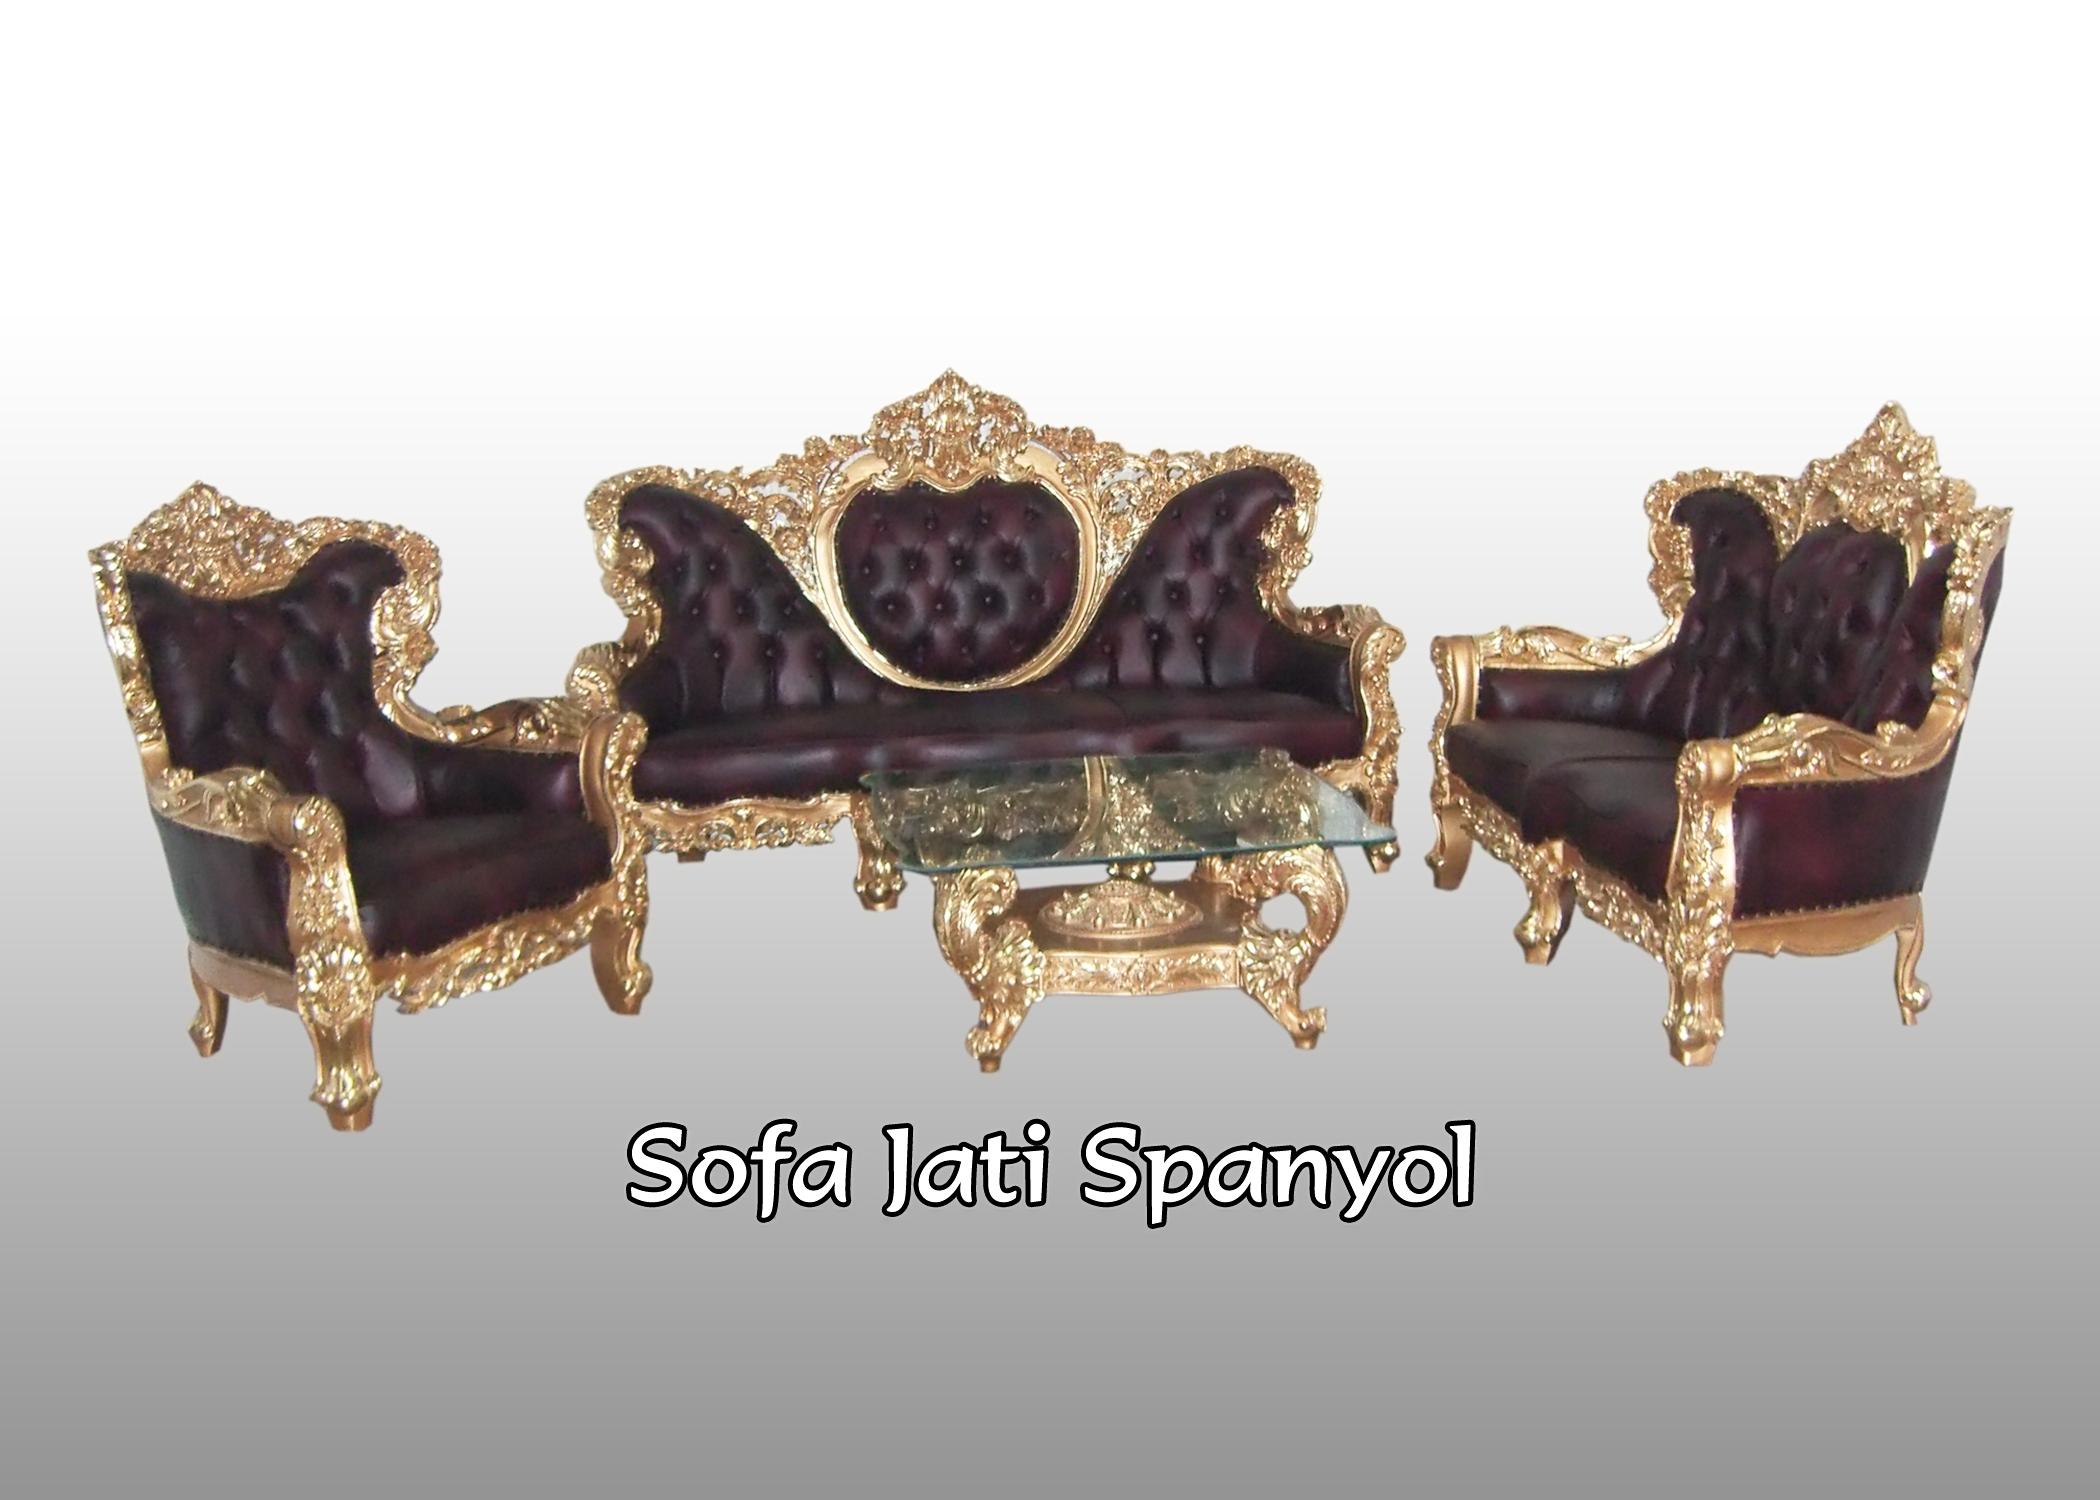 indonesian carved furniture exporter  Furniture Classic Jakarta